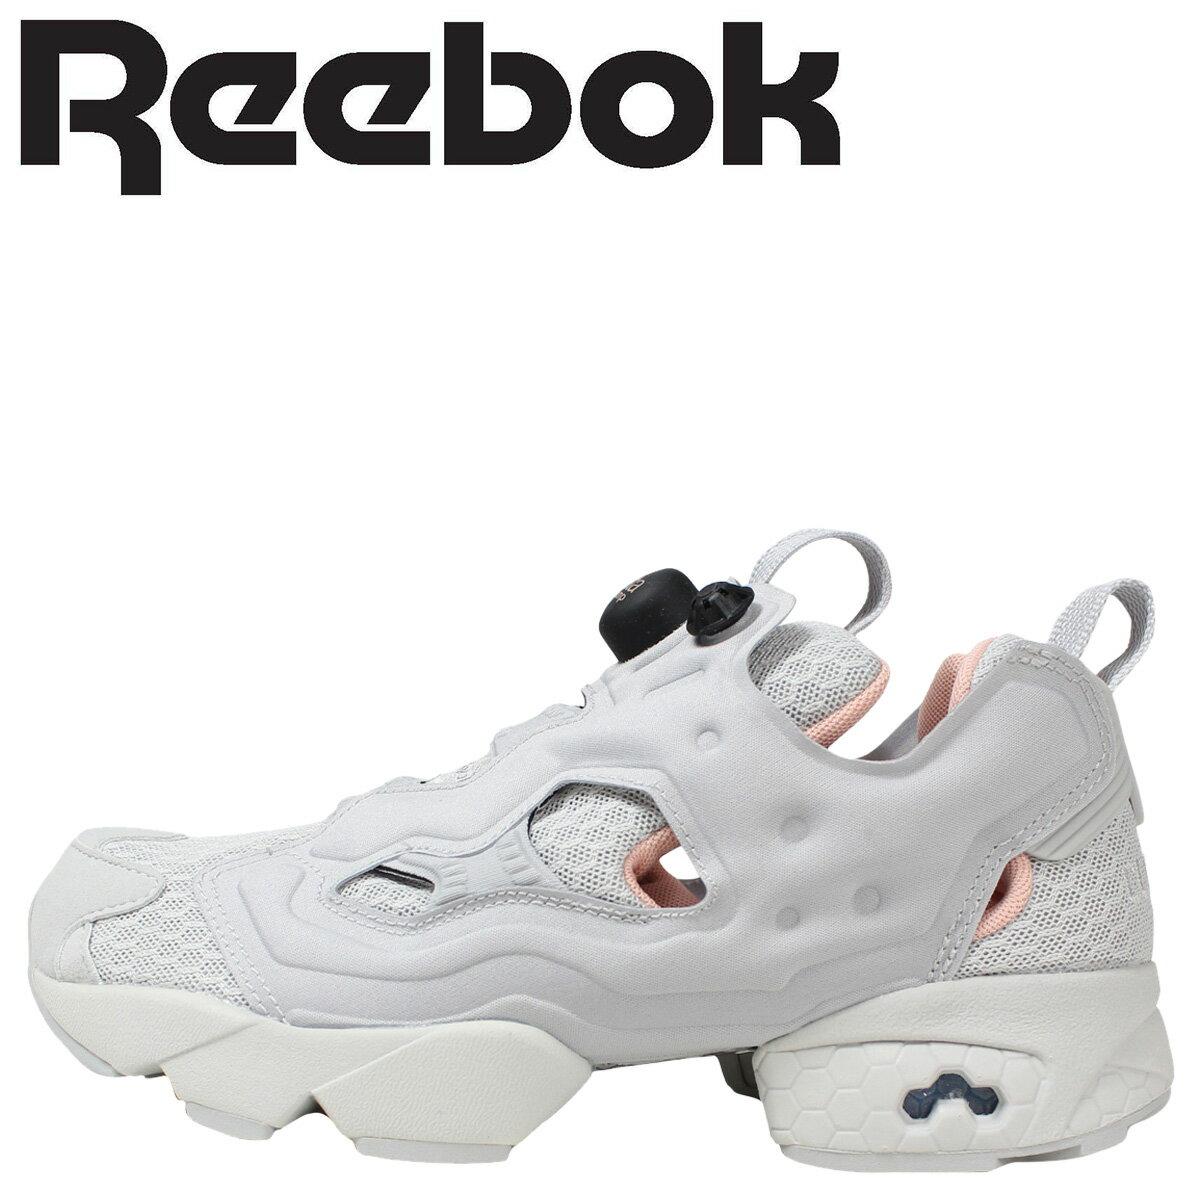 Reebok リーボック ポンプフューリー クラスヘックス スニーカー INSTAPUMP FURY CLSHX V69687 メンズ レディース 靴 グレー